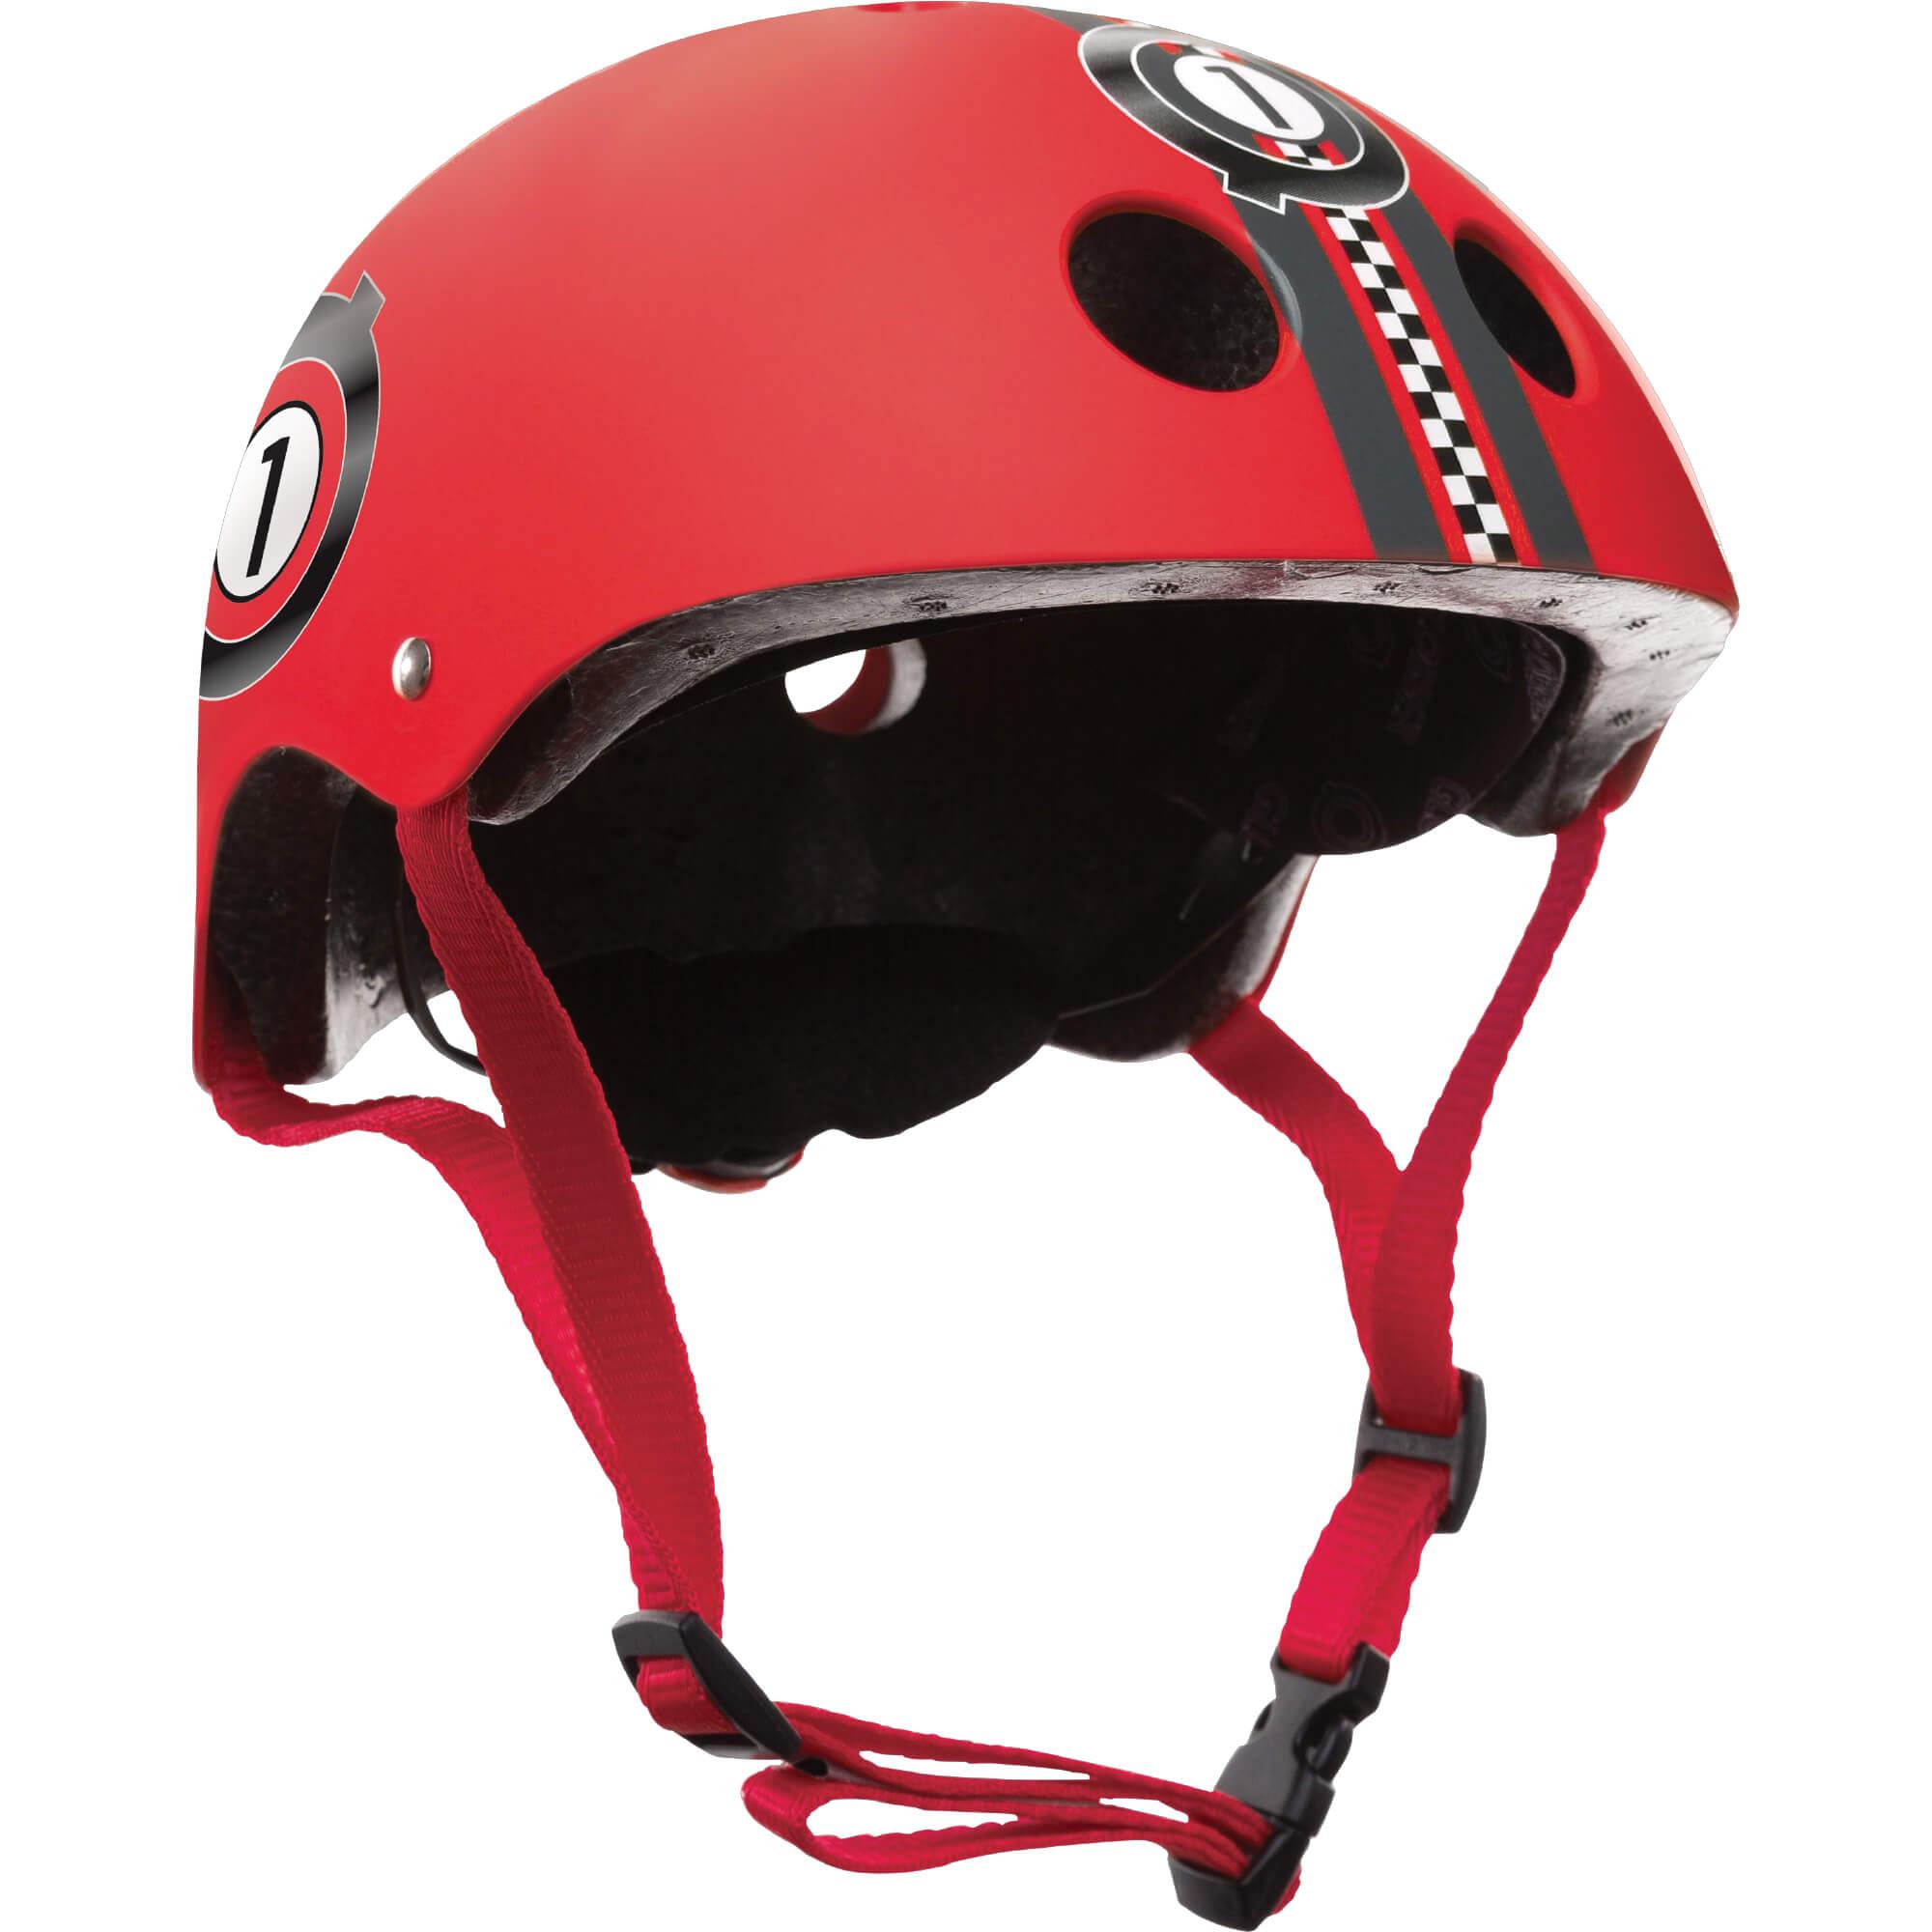 Red Race Helmet imagine